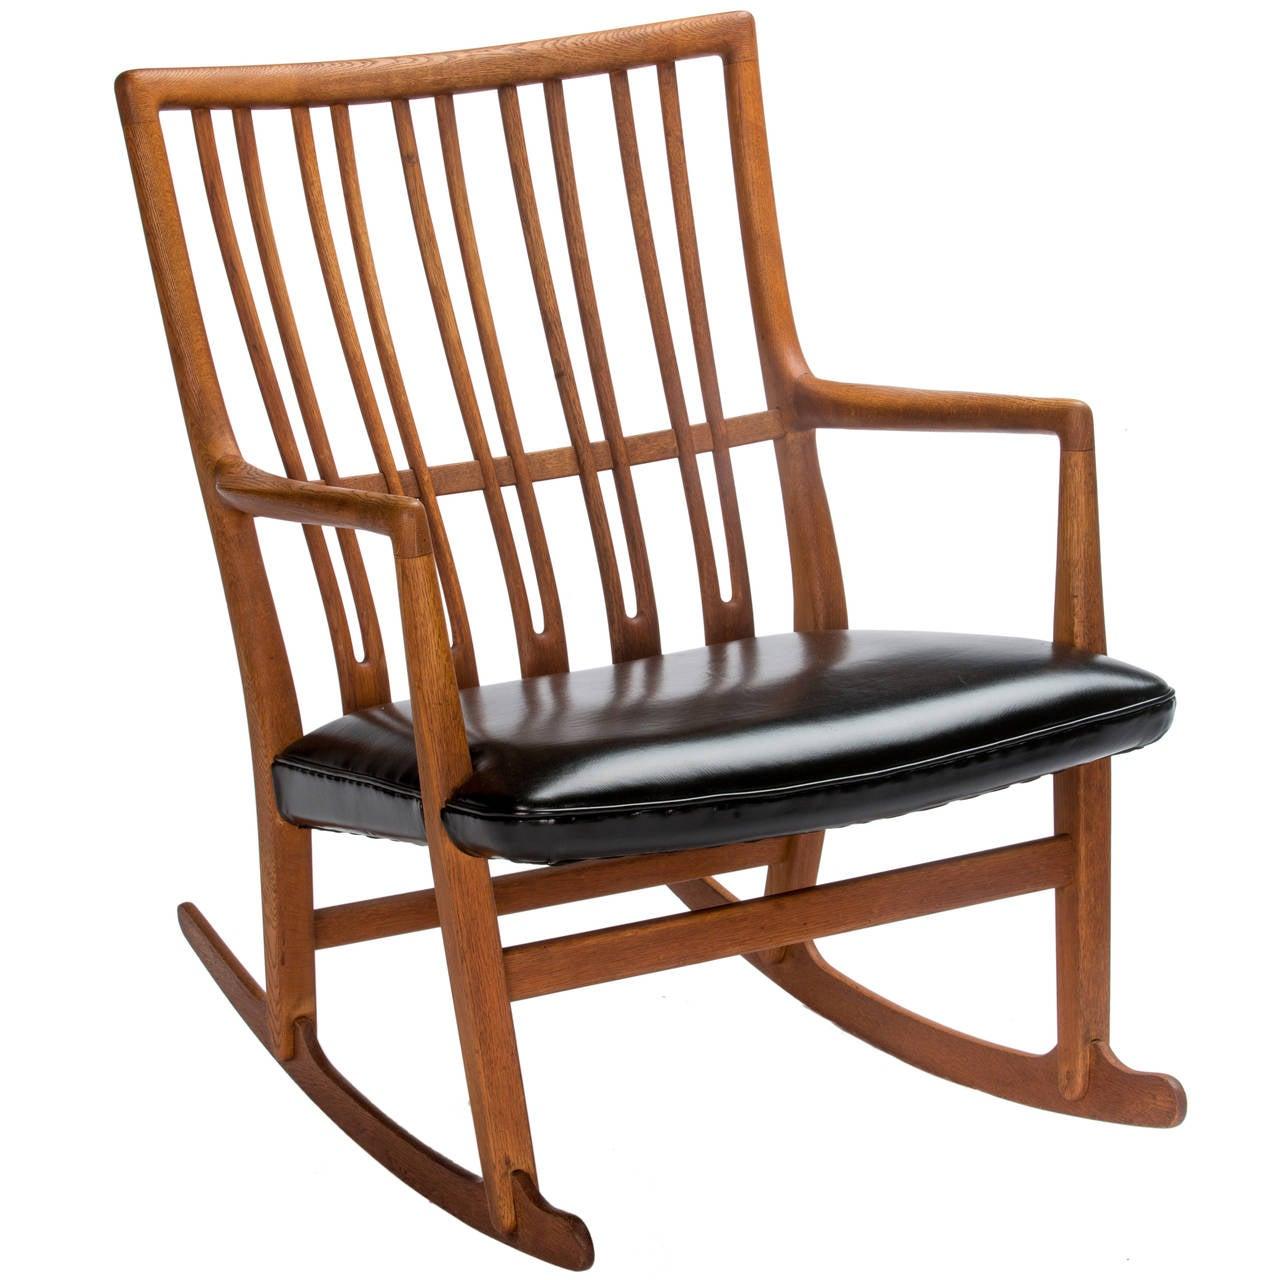 hans wegner rocking chair for toddler mikael laursen ml 33 sale at 1stdibs